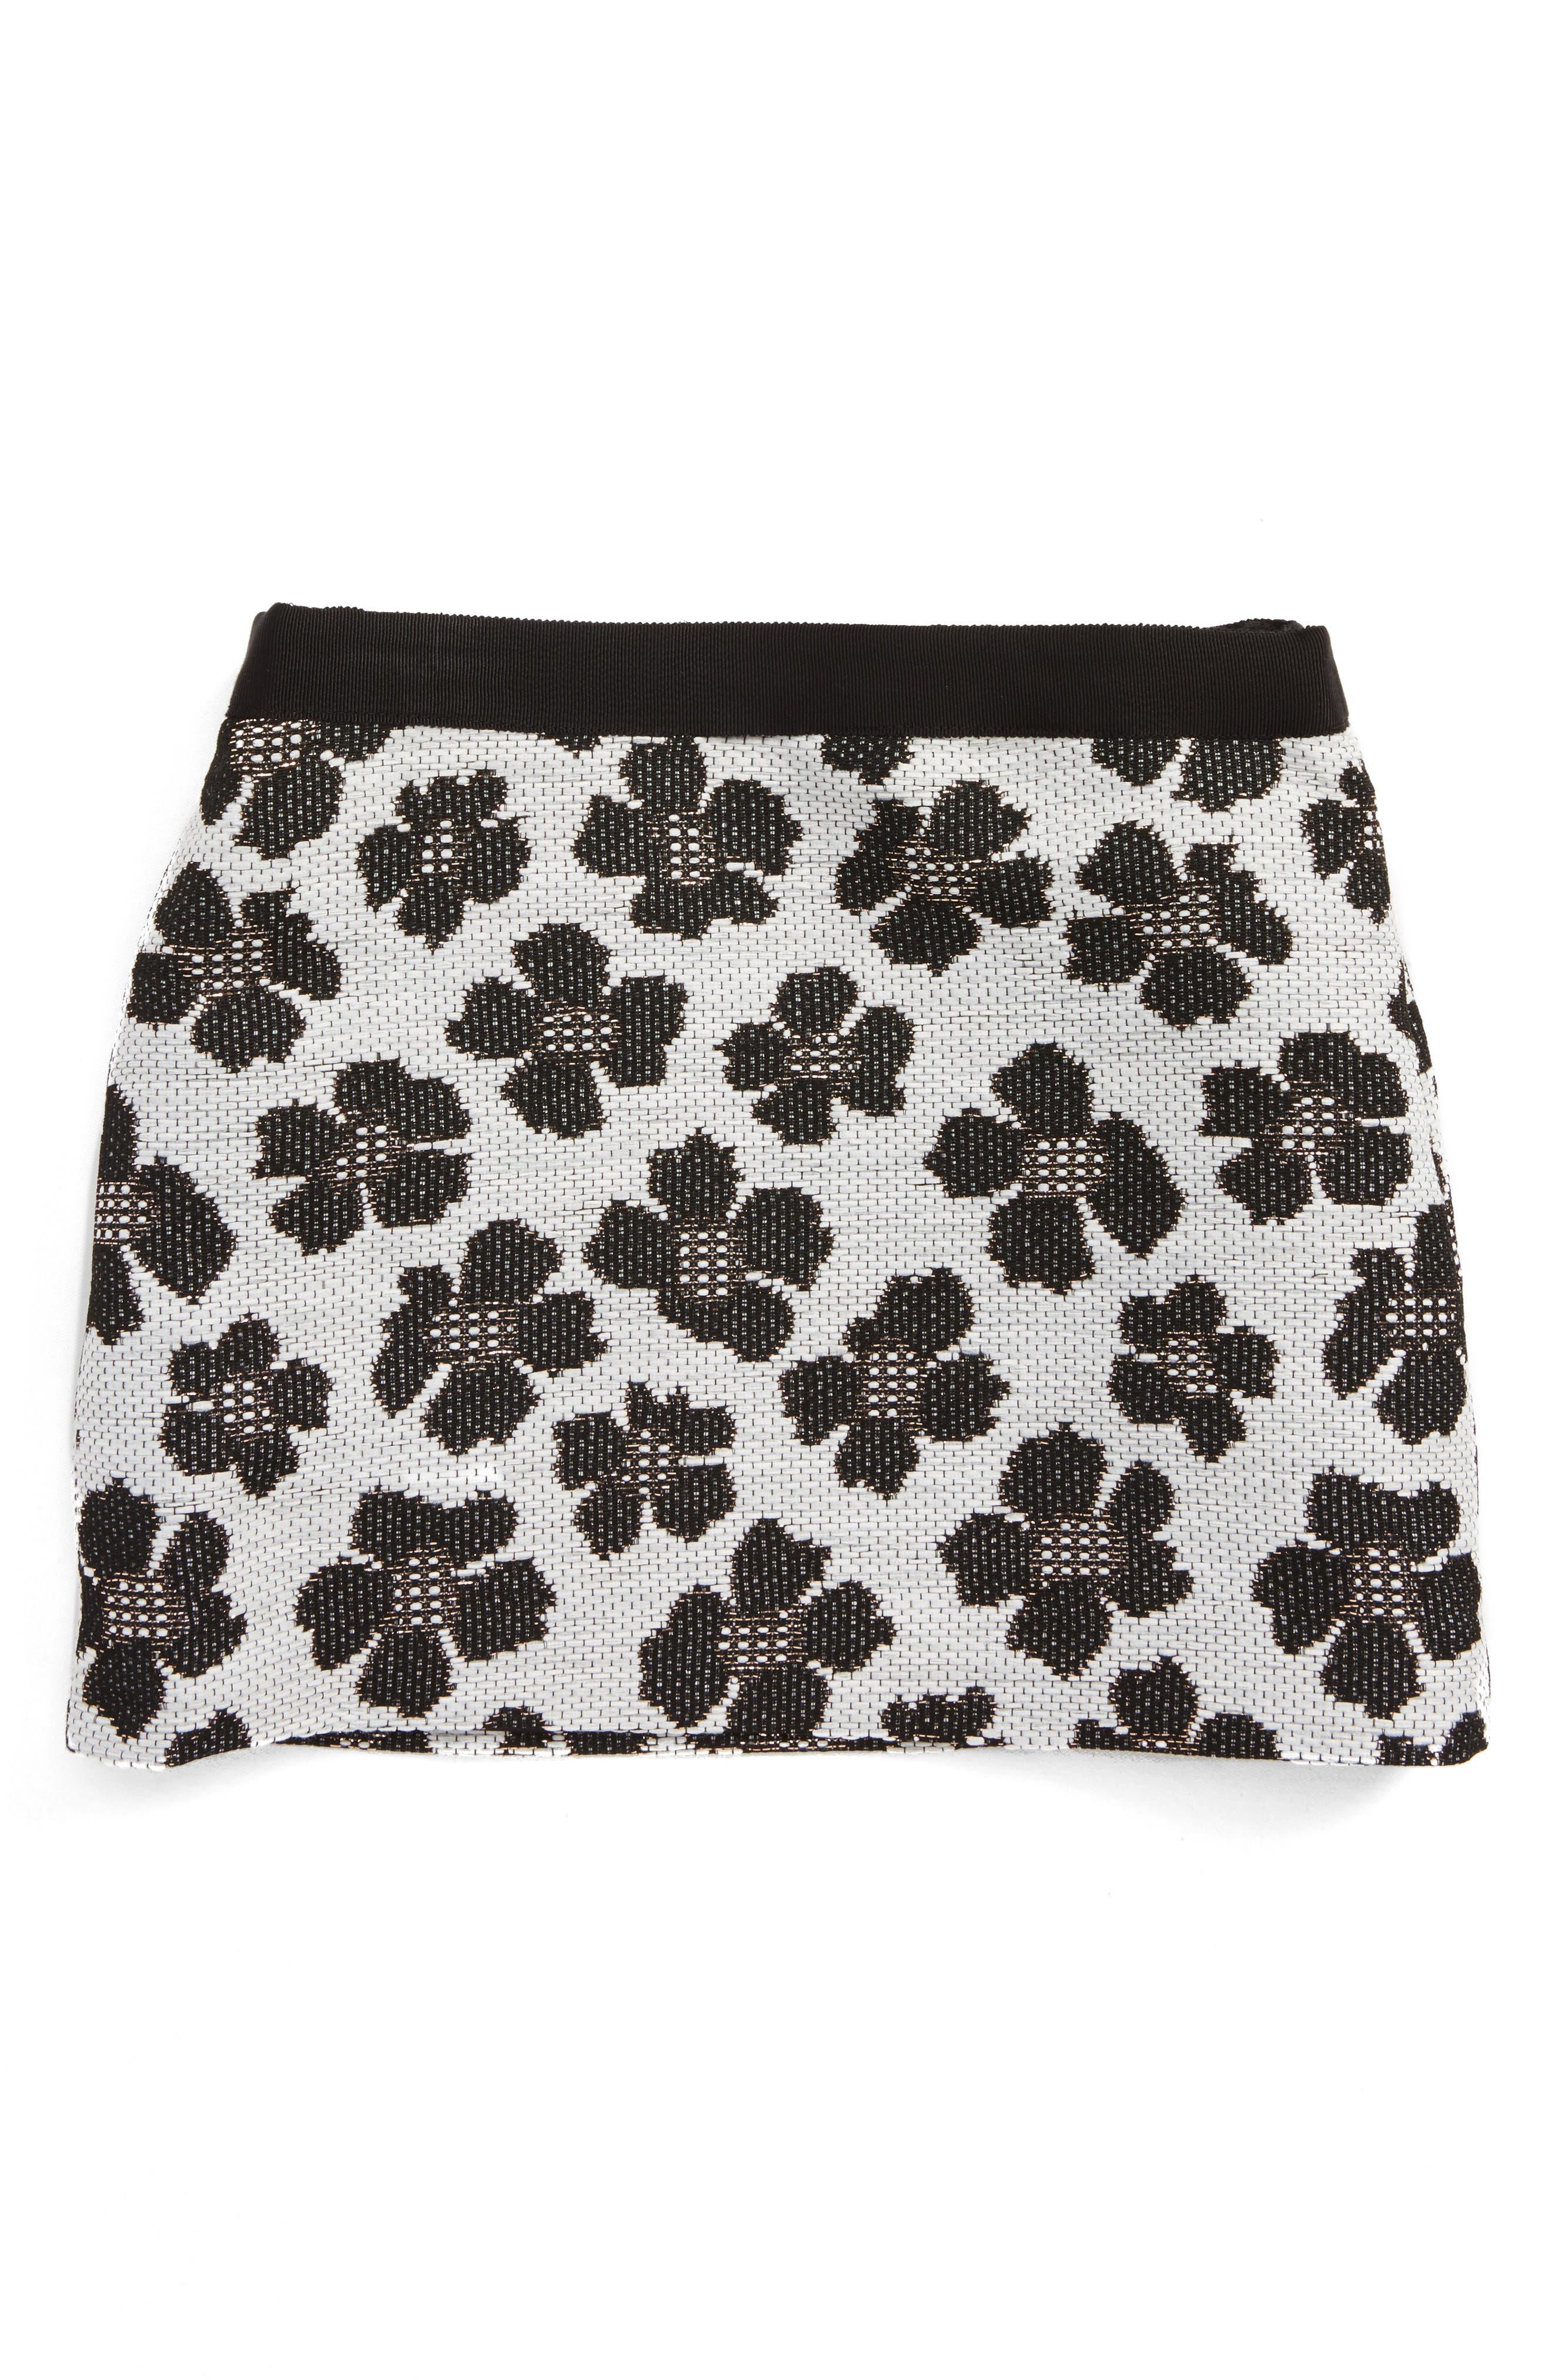 Milly Minis Metallic Jacquard Miniskirt (Big Girls)